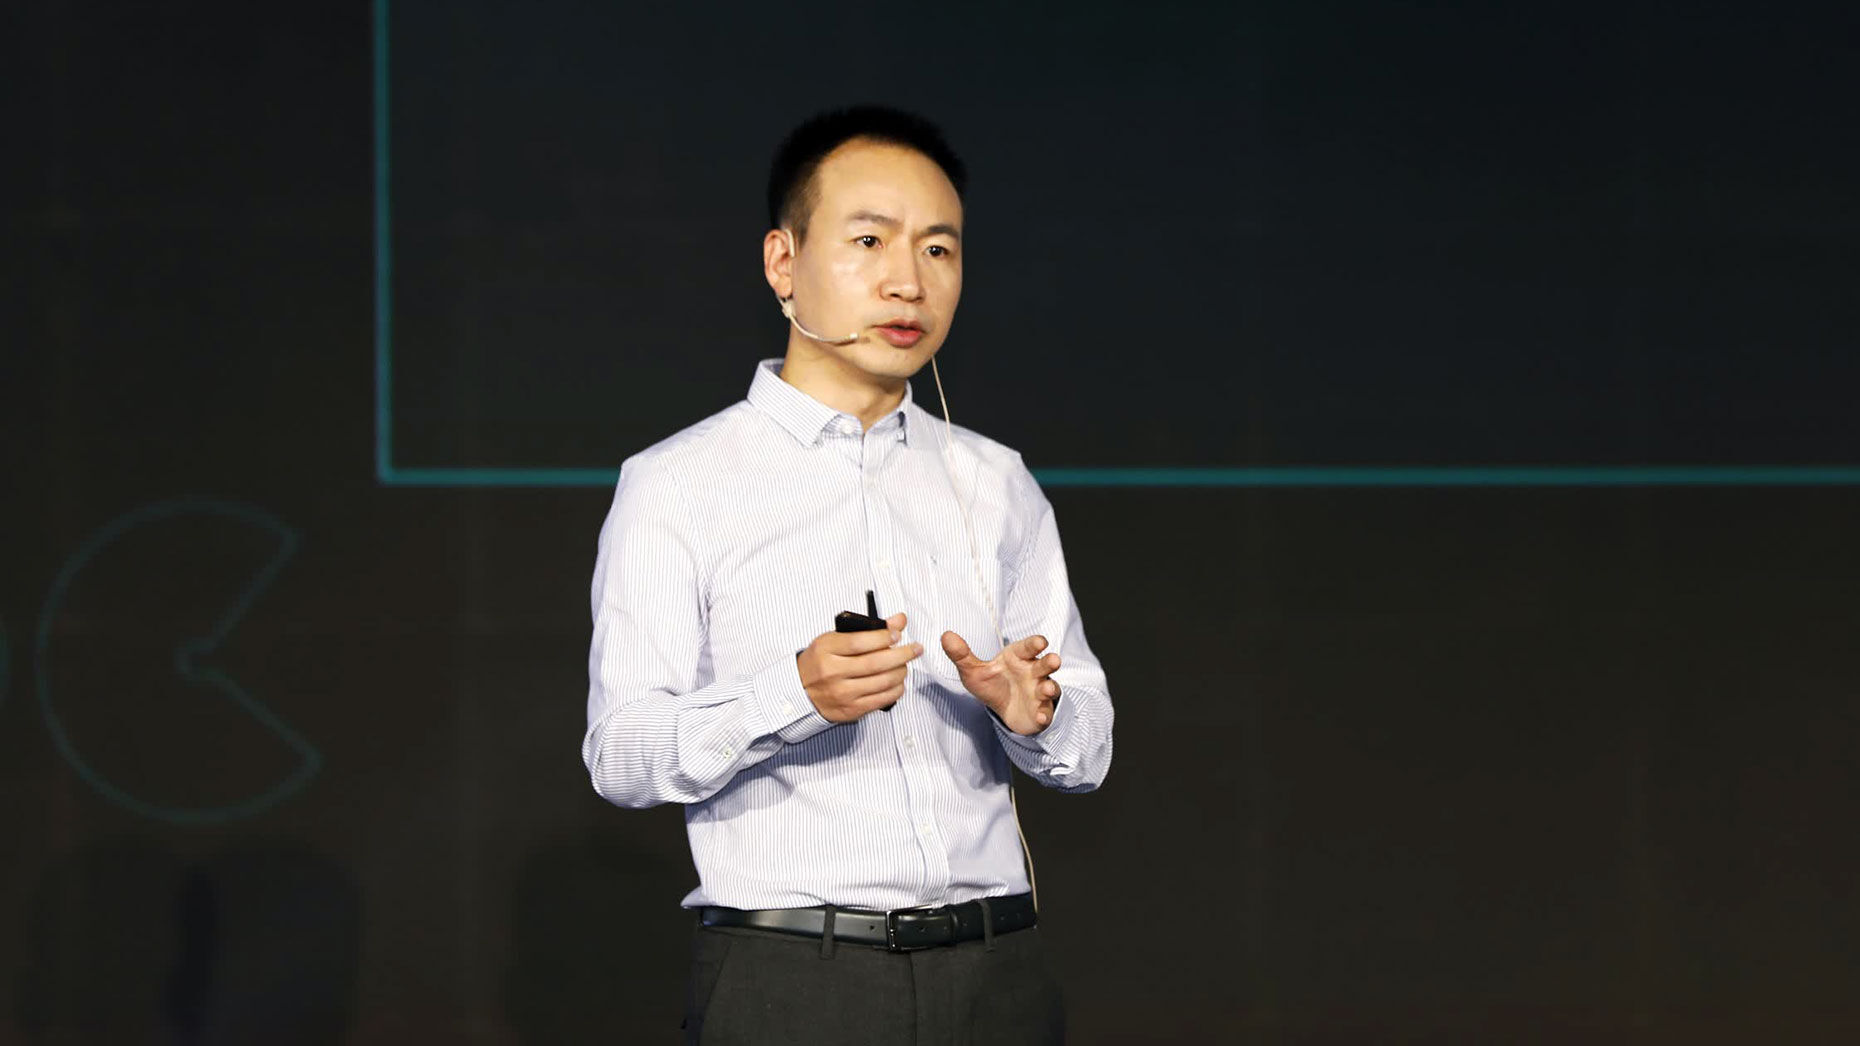 Sensors Data CEO, Sang Wenfeng. Photo by Sensors Data.